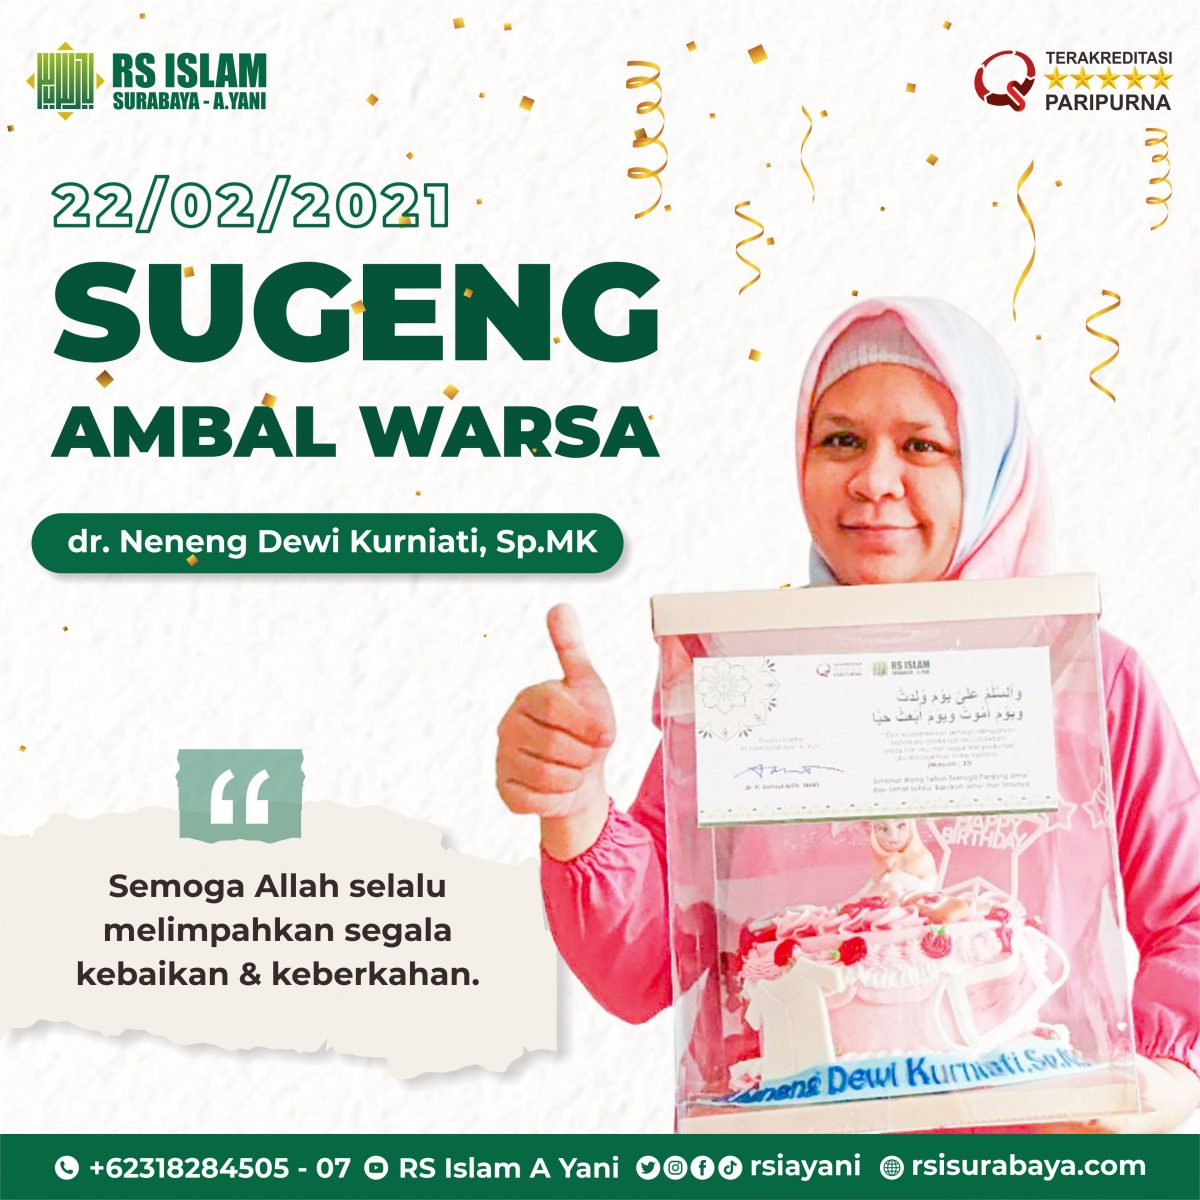 dr.-Neneng-Dewi-Kurniati-Sp.MK_-1200x1200.jpg